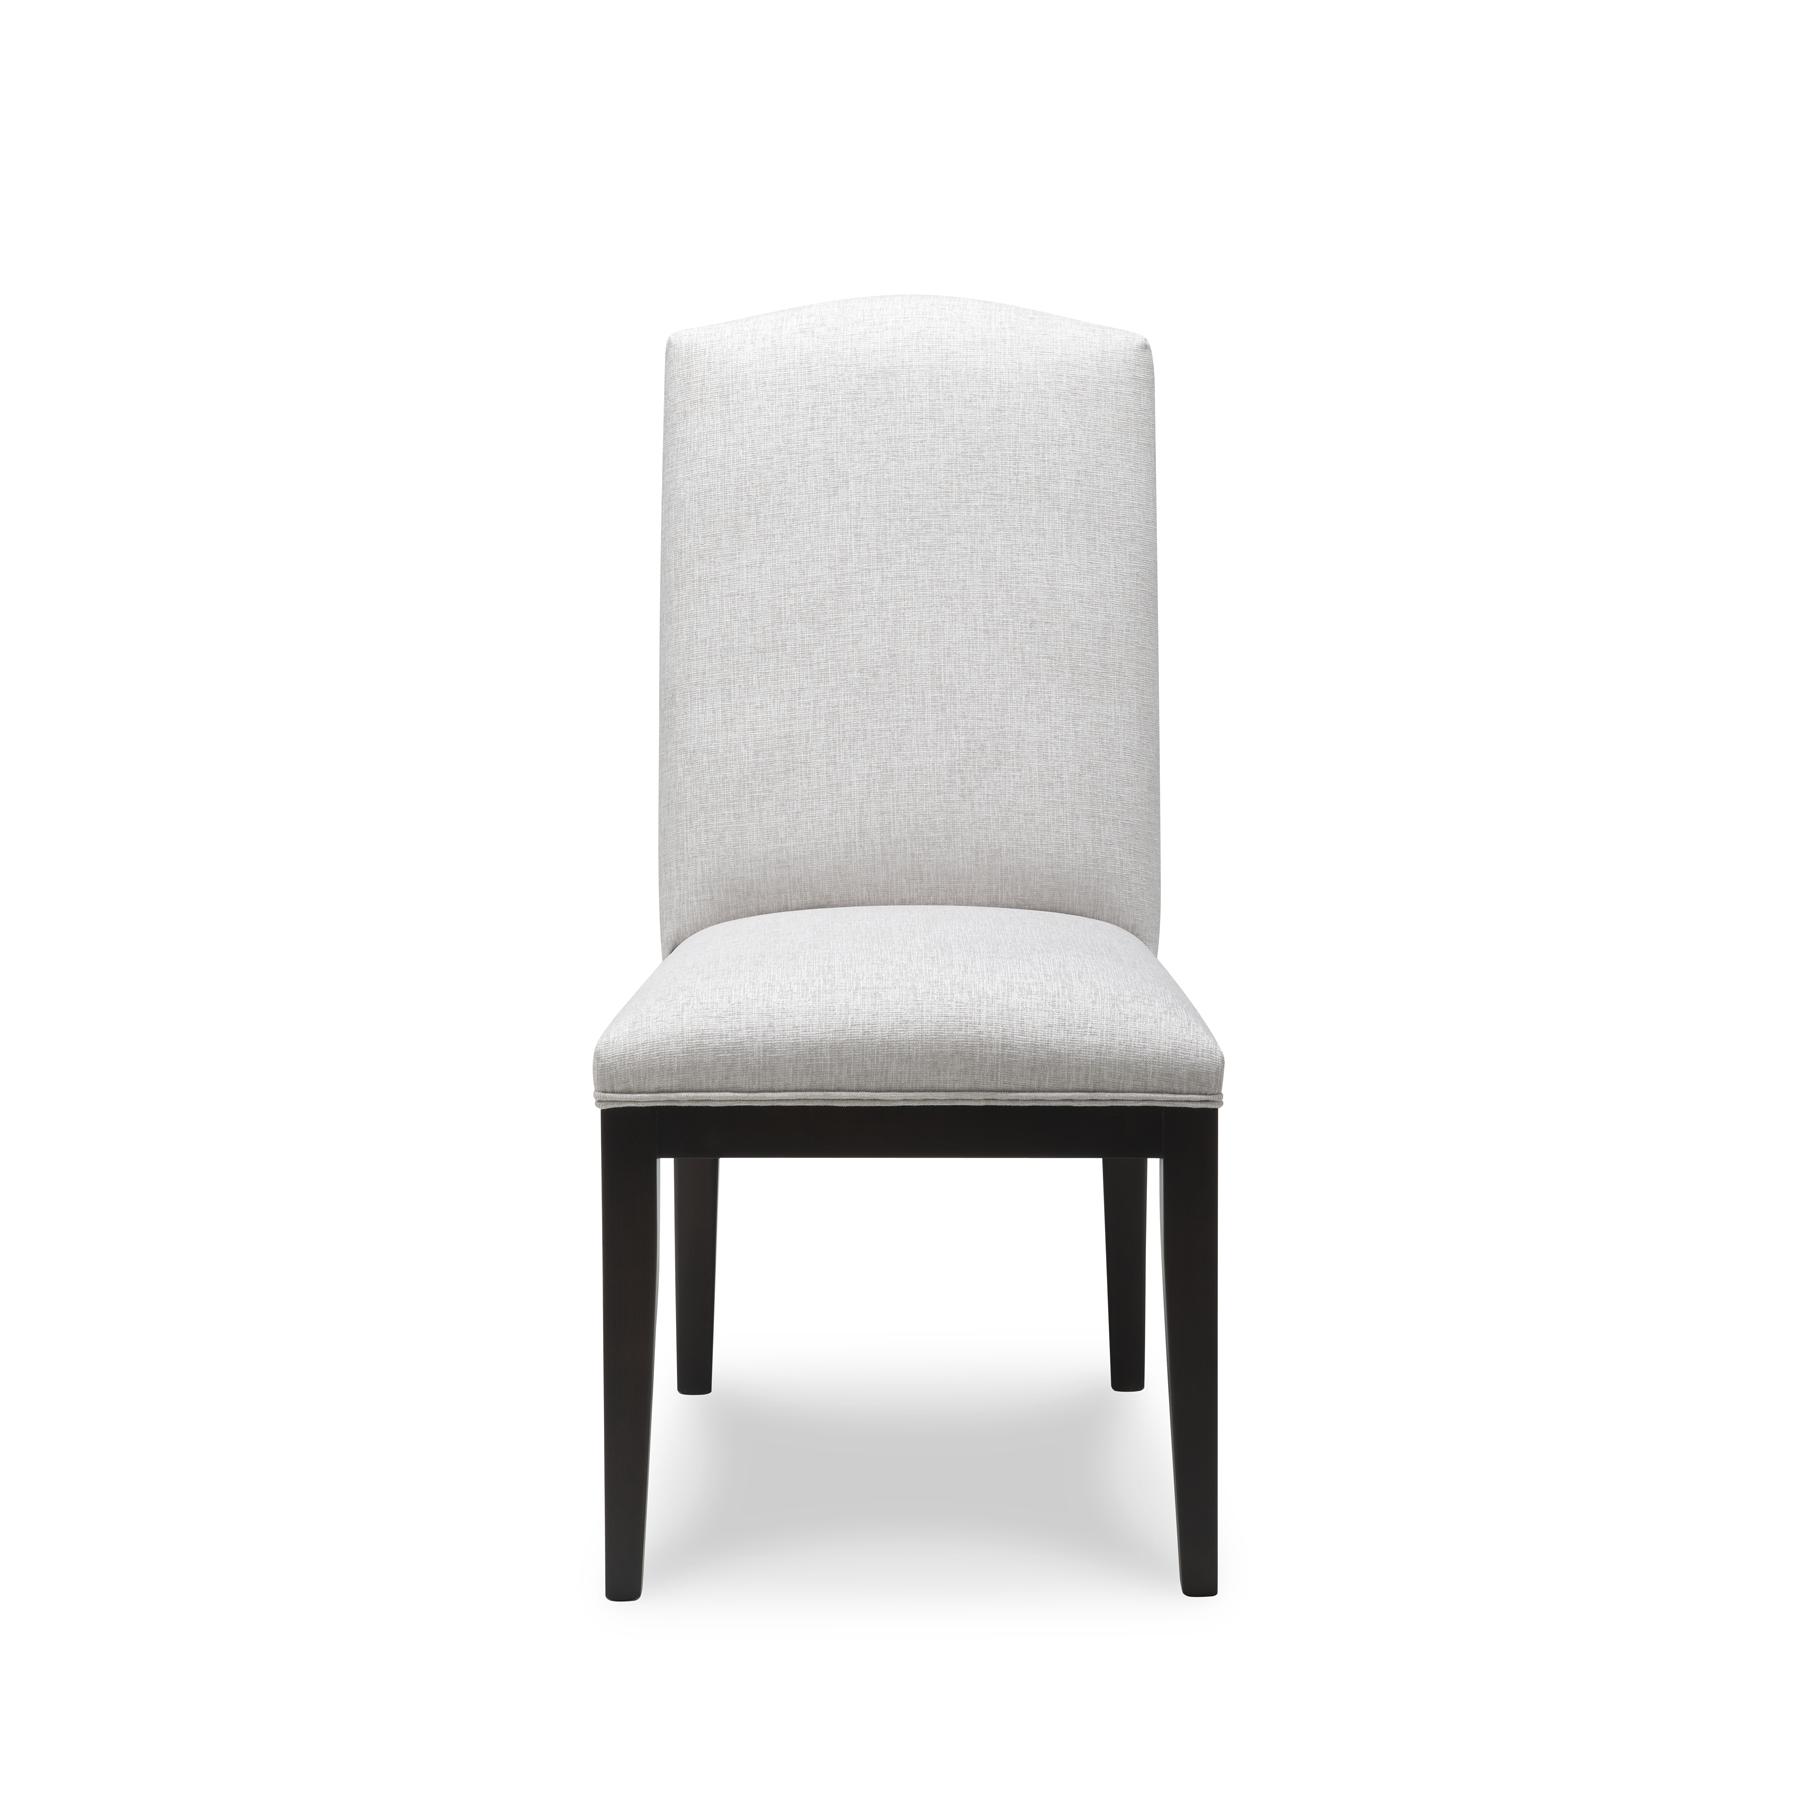 Stewart-Chair-A-PROOF-1-1.jpg